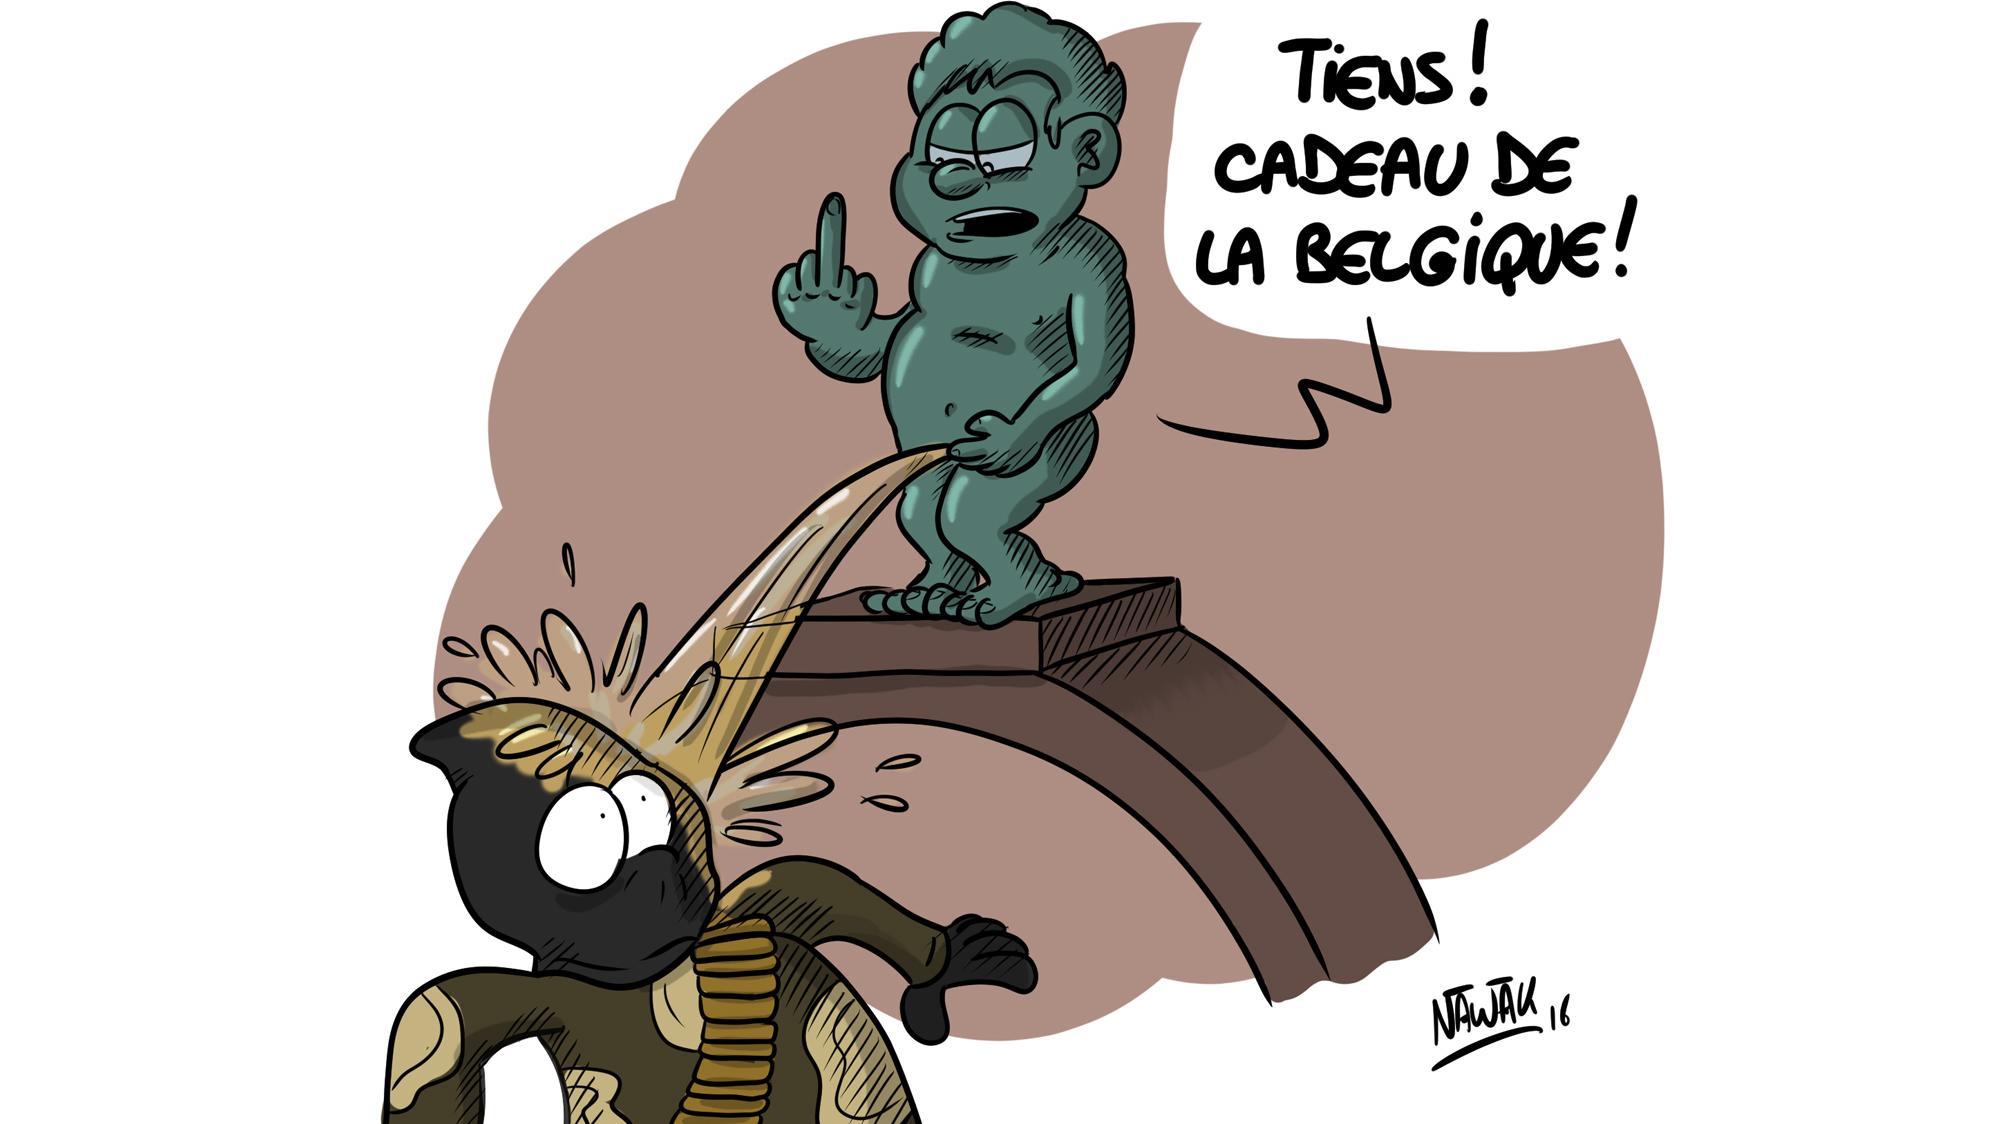 attentats-belgique.jpg